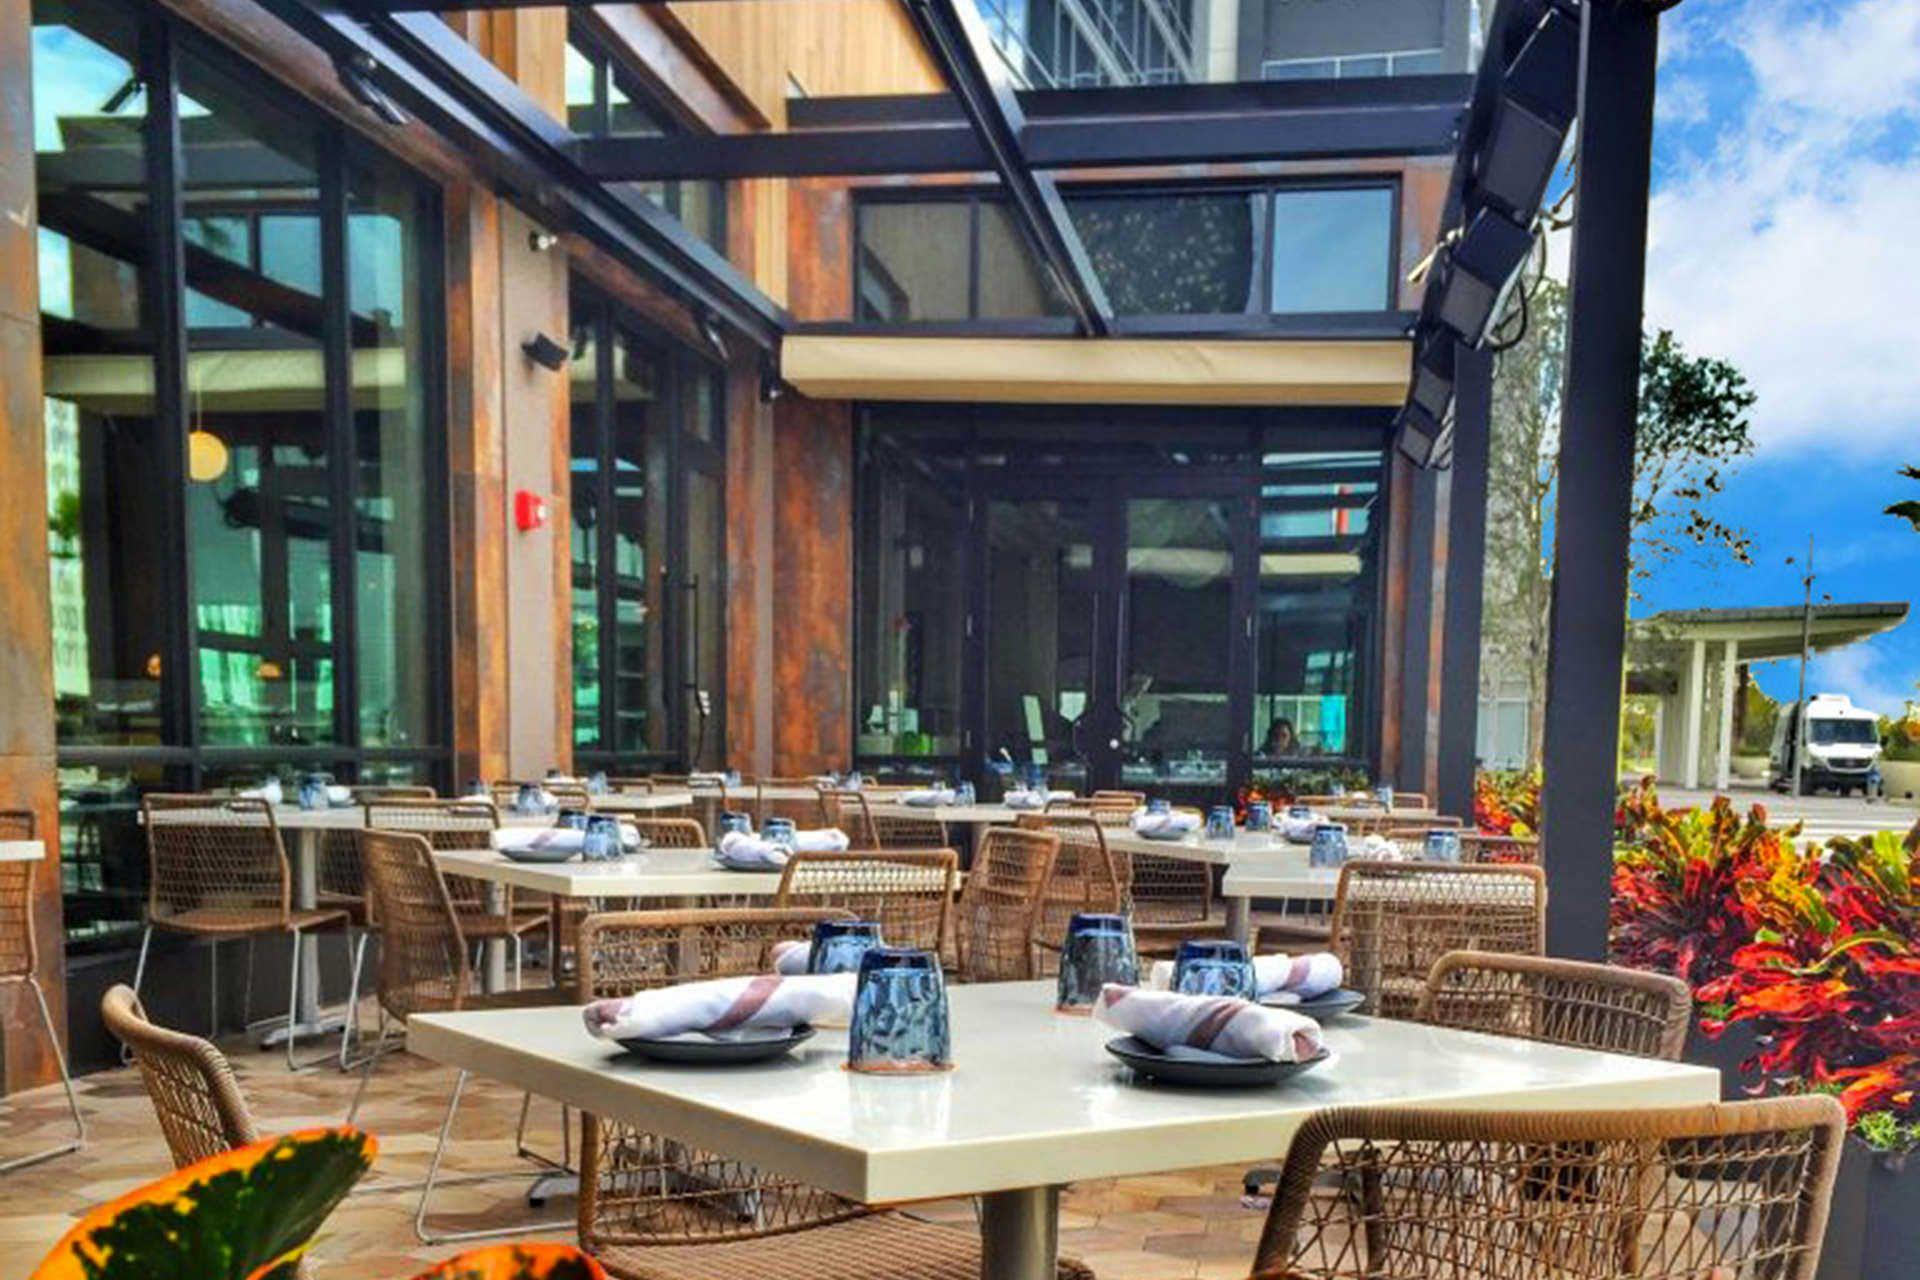 Serving Guests A Modern American Menu Chroma Modern Kitchen Bar Offers Patrons A Big City Flair In Lake Nona Wit Modern Bar Modern Kitchen Bar Kitchen Bar